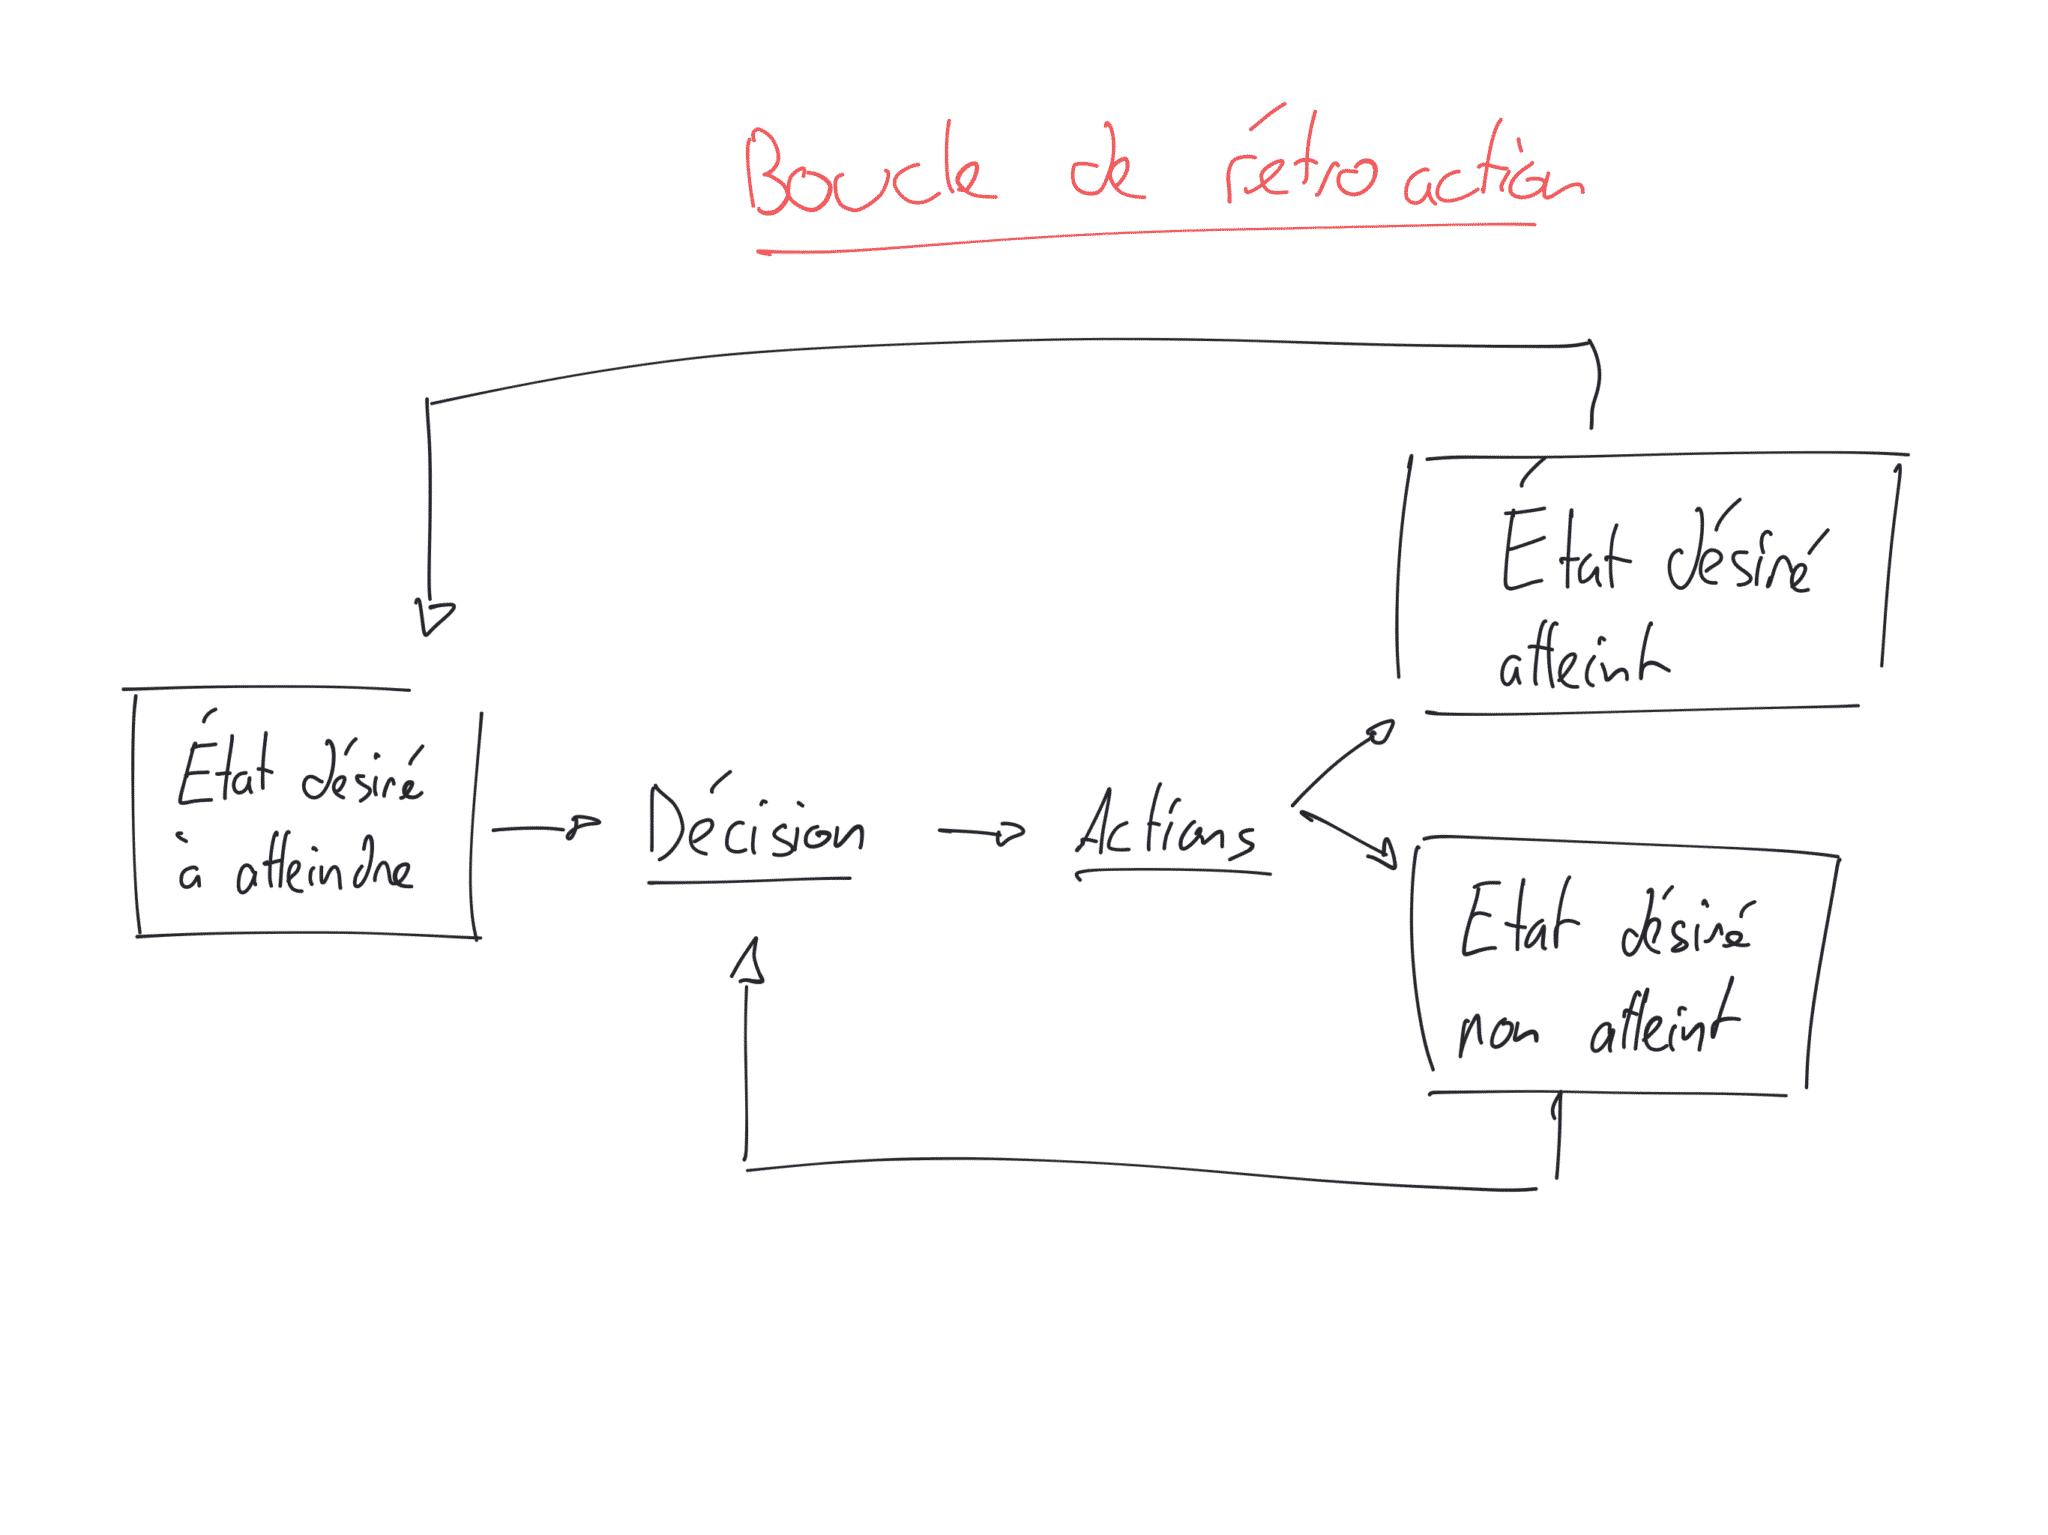 feed-back systémique